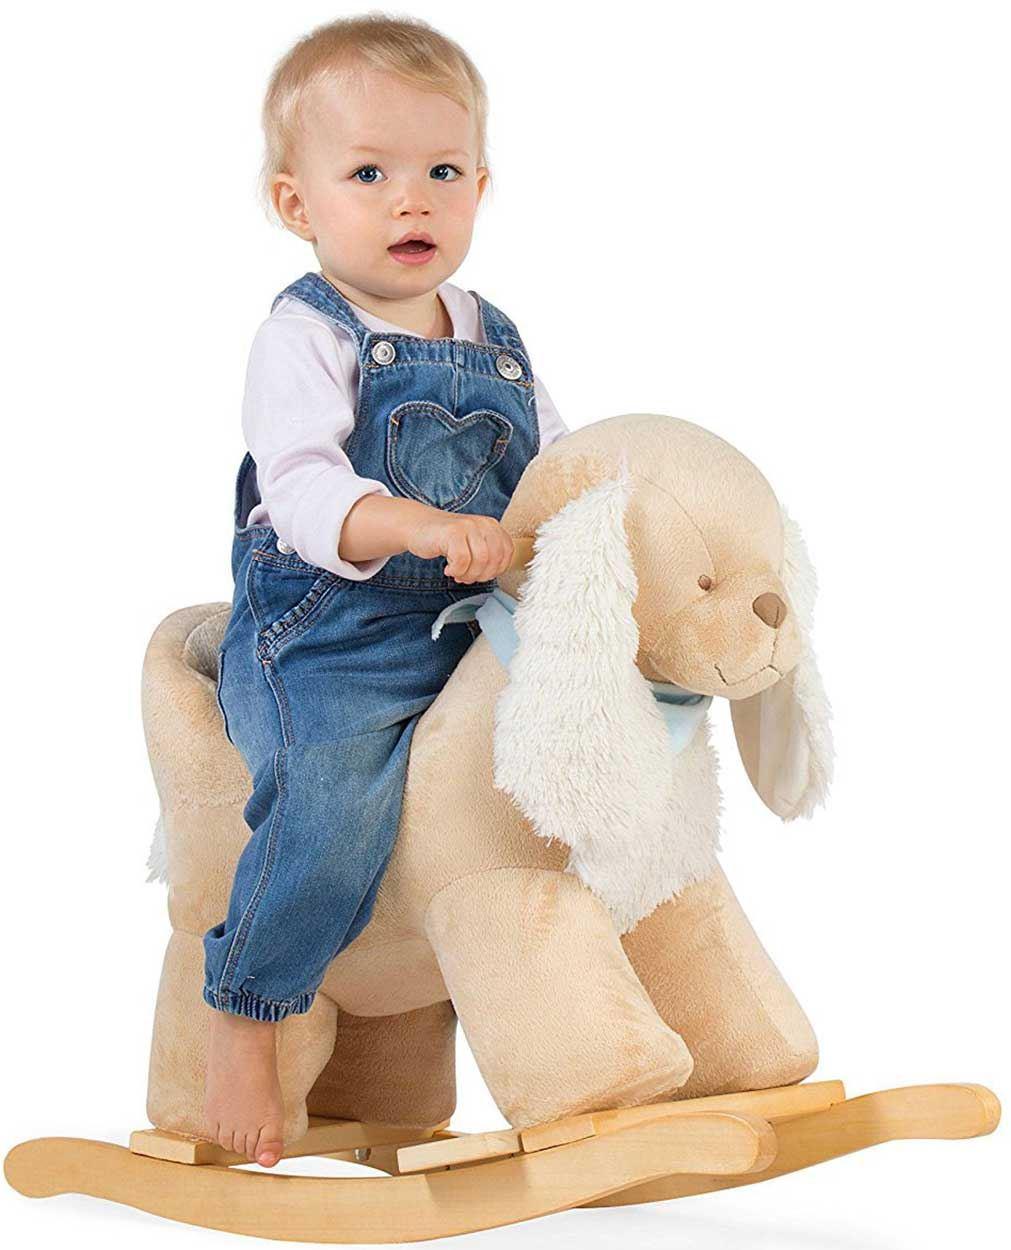 Cavallo A Dondolo In Peluche.Kaloo Les Amis Cavallo A Dondolo Legno Peluche Bambino Regalo Cane